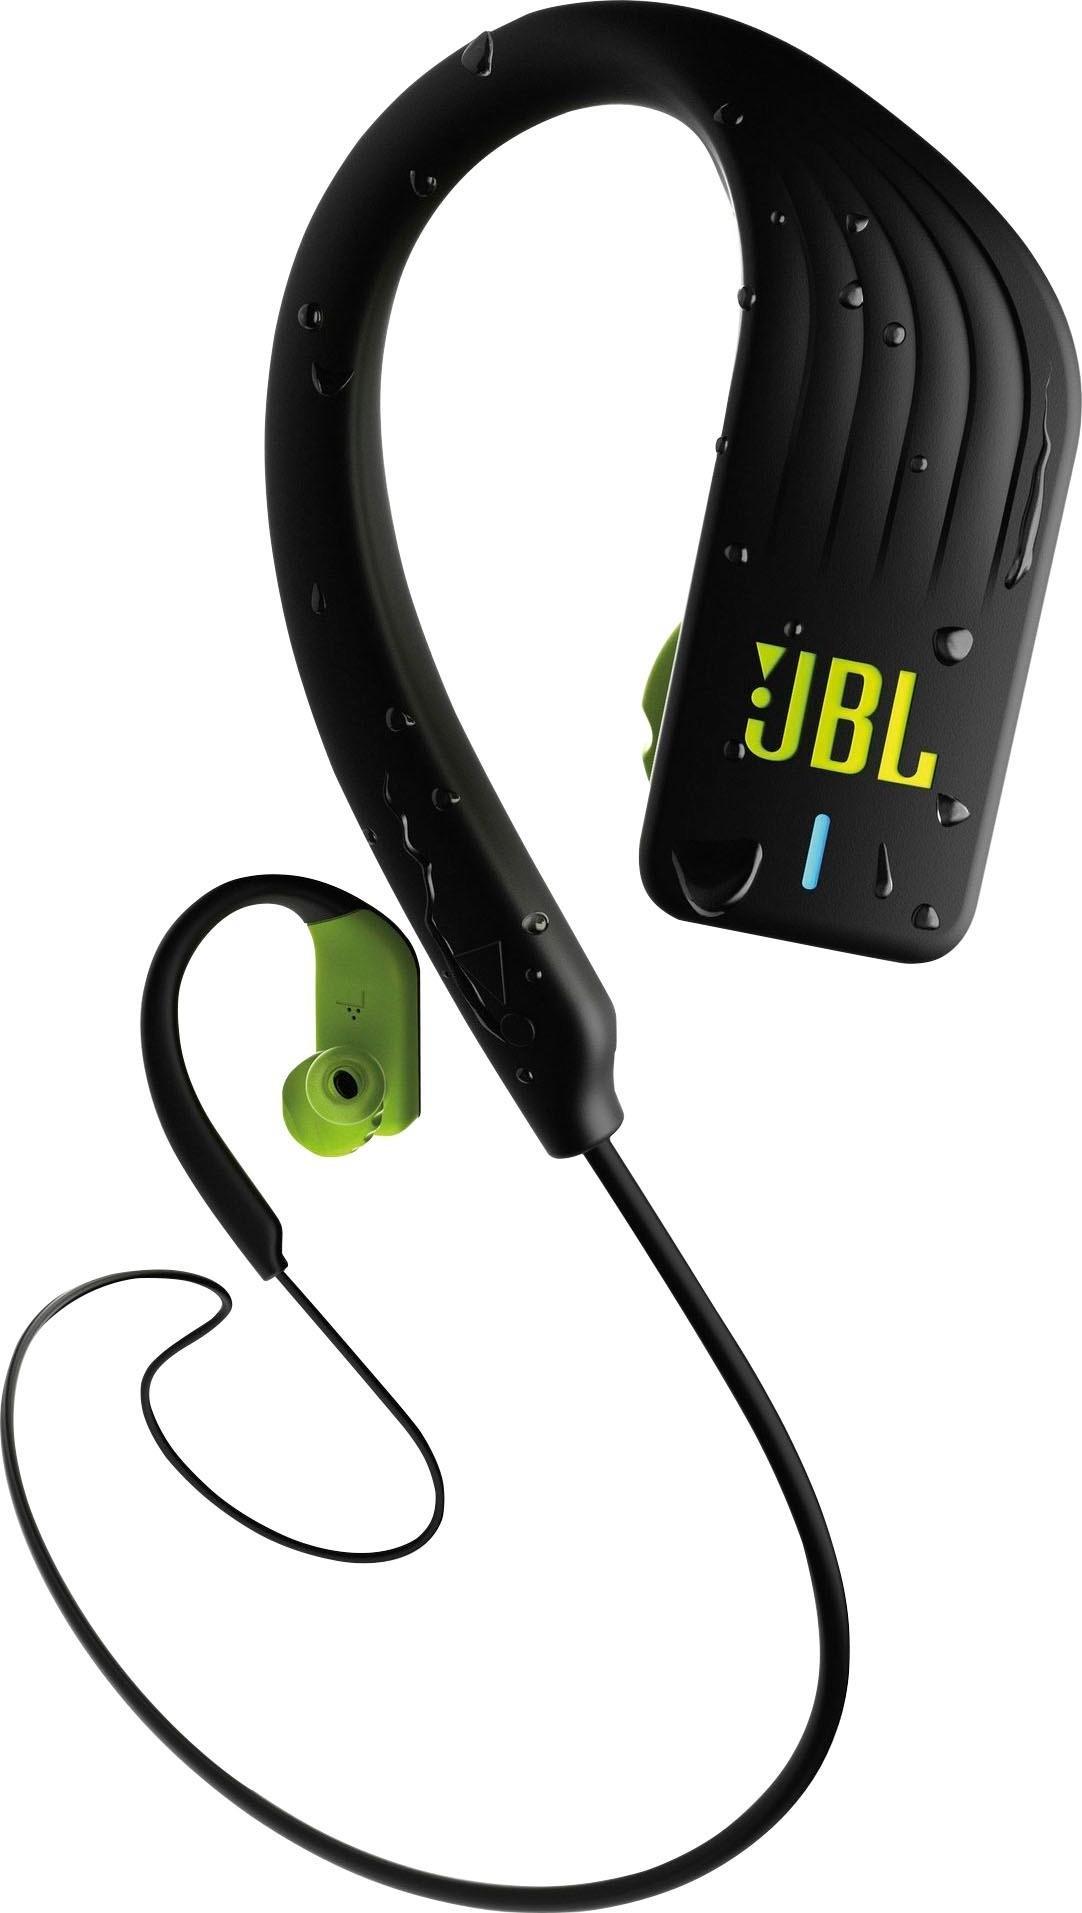 JBL »Endurance Sprint« in-ear-hoofdtelefoon (bluetooth, handsfreefunctie) veilig op otto.nl kopen